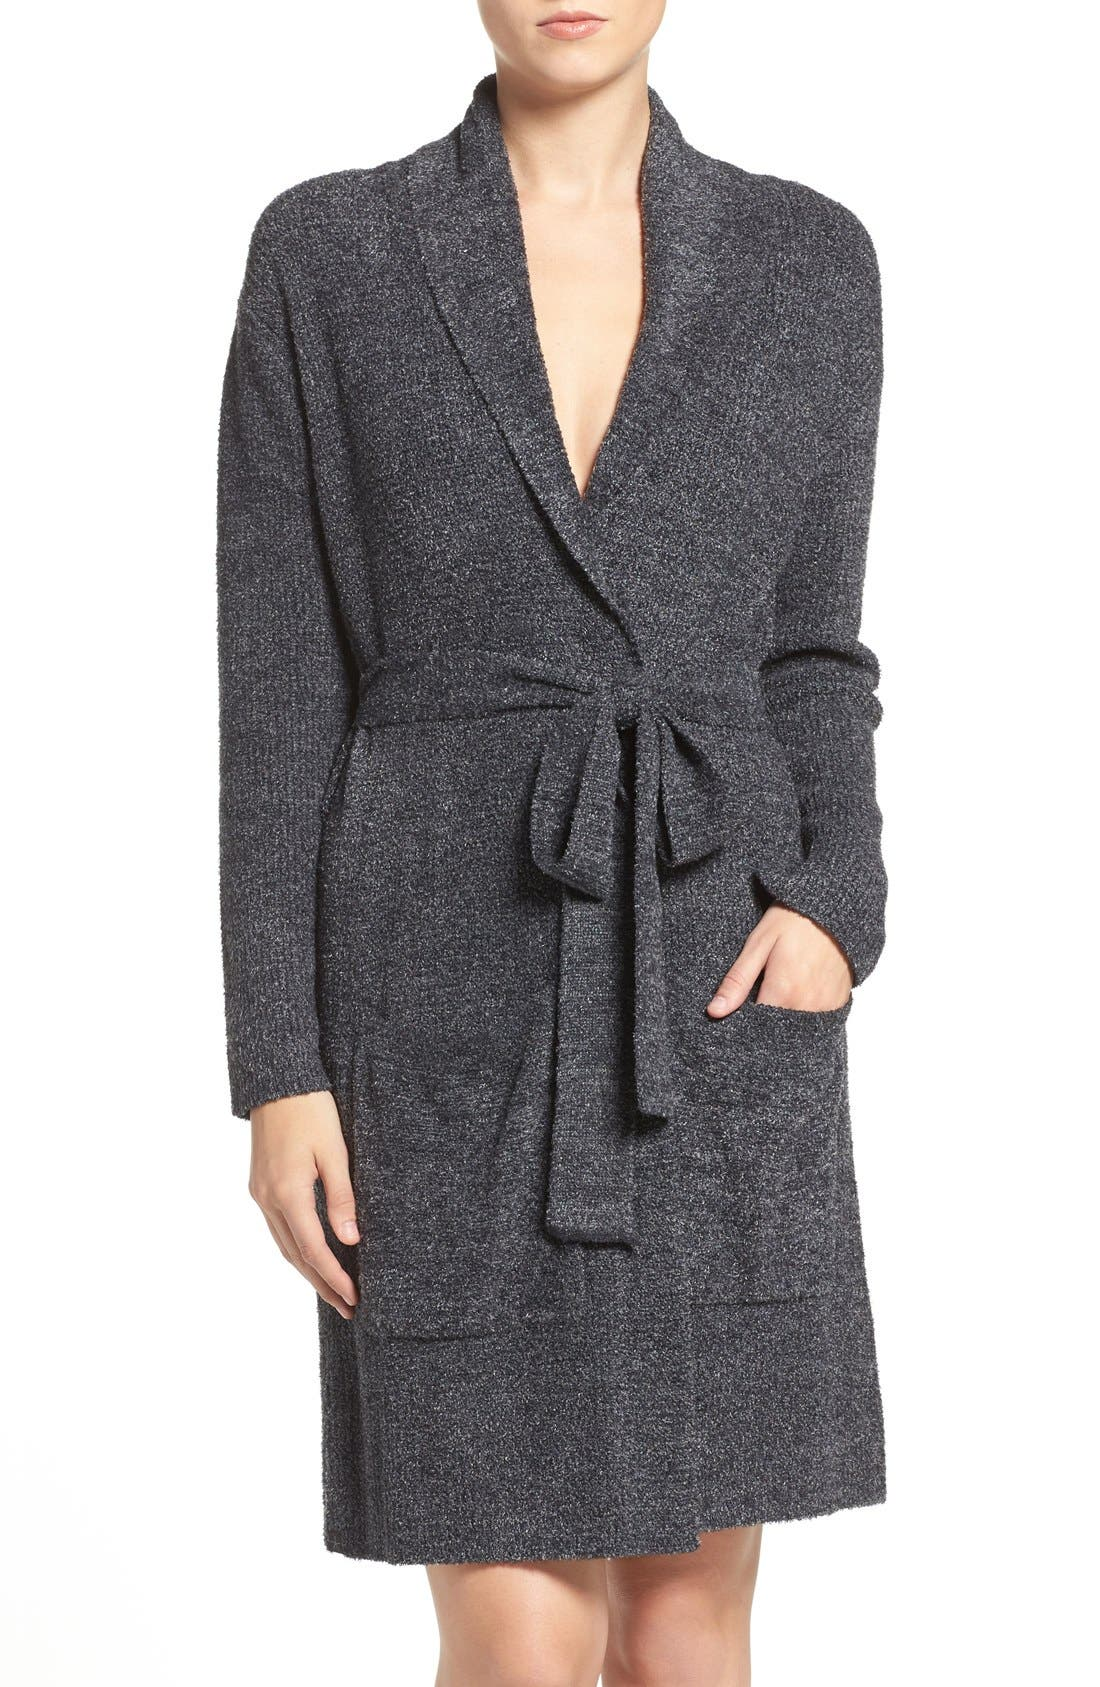 Barefoot Dreams CozyChic Lite® Short Robe